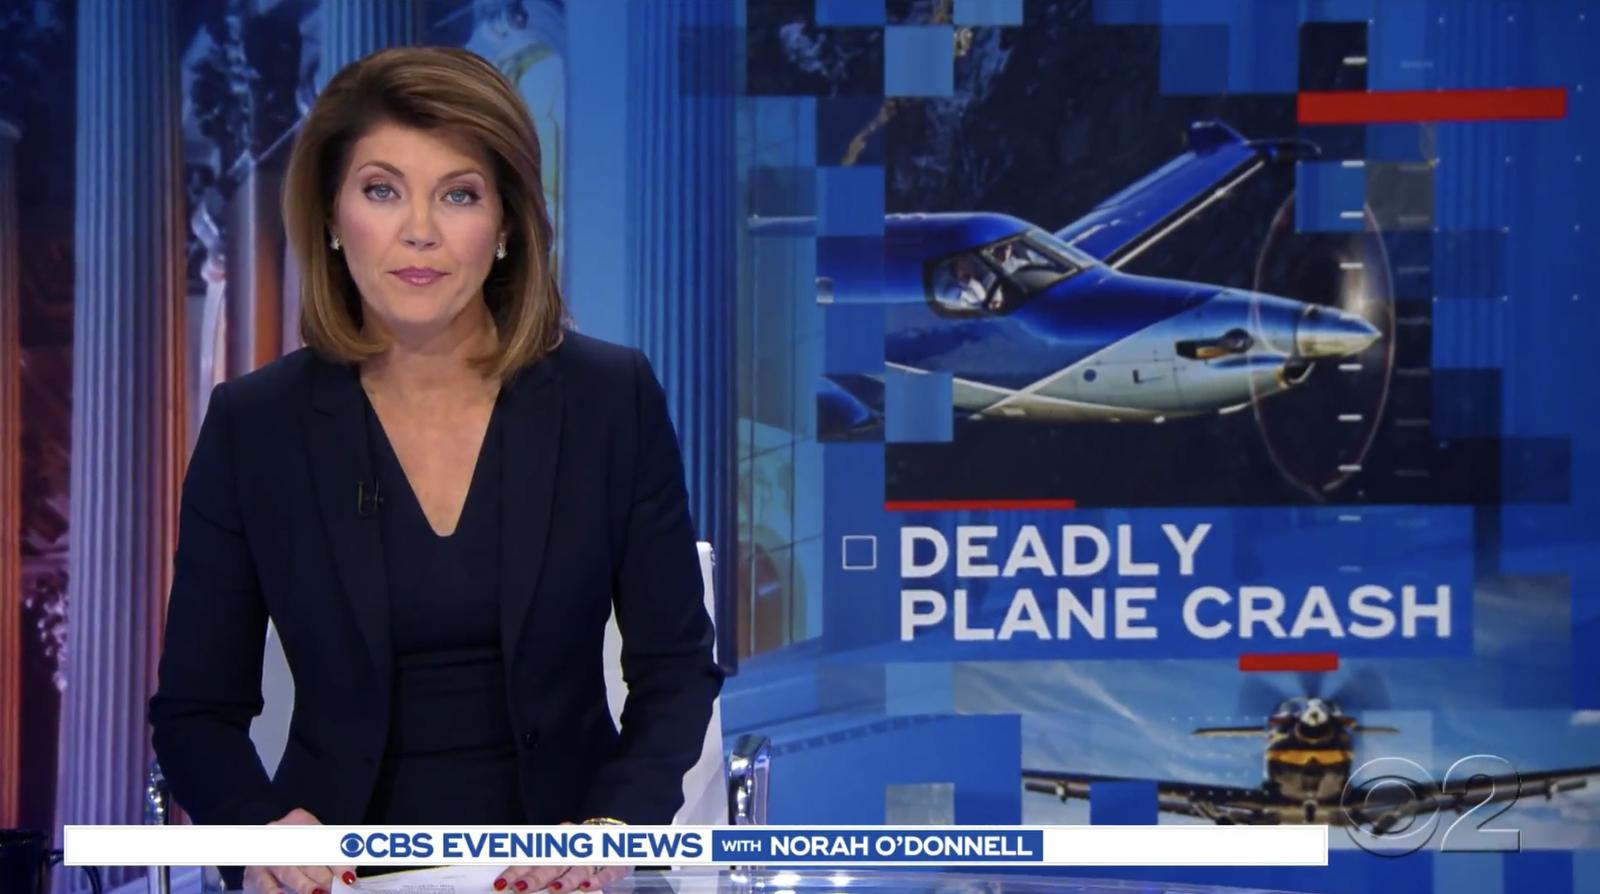 NCS_CBS-Evening-News_Motion-Design_Washington_013